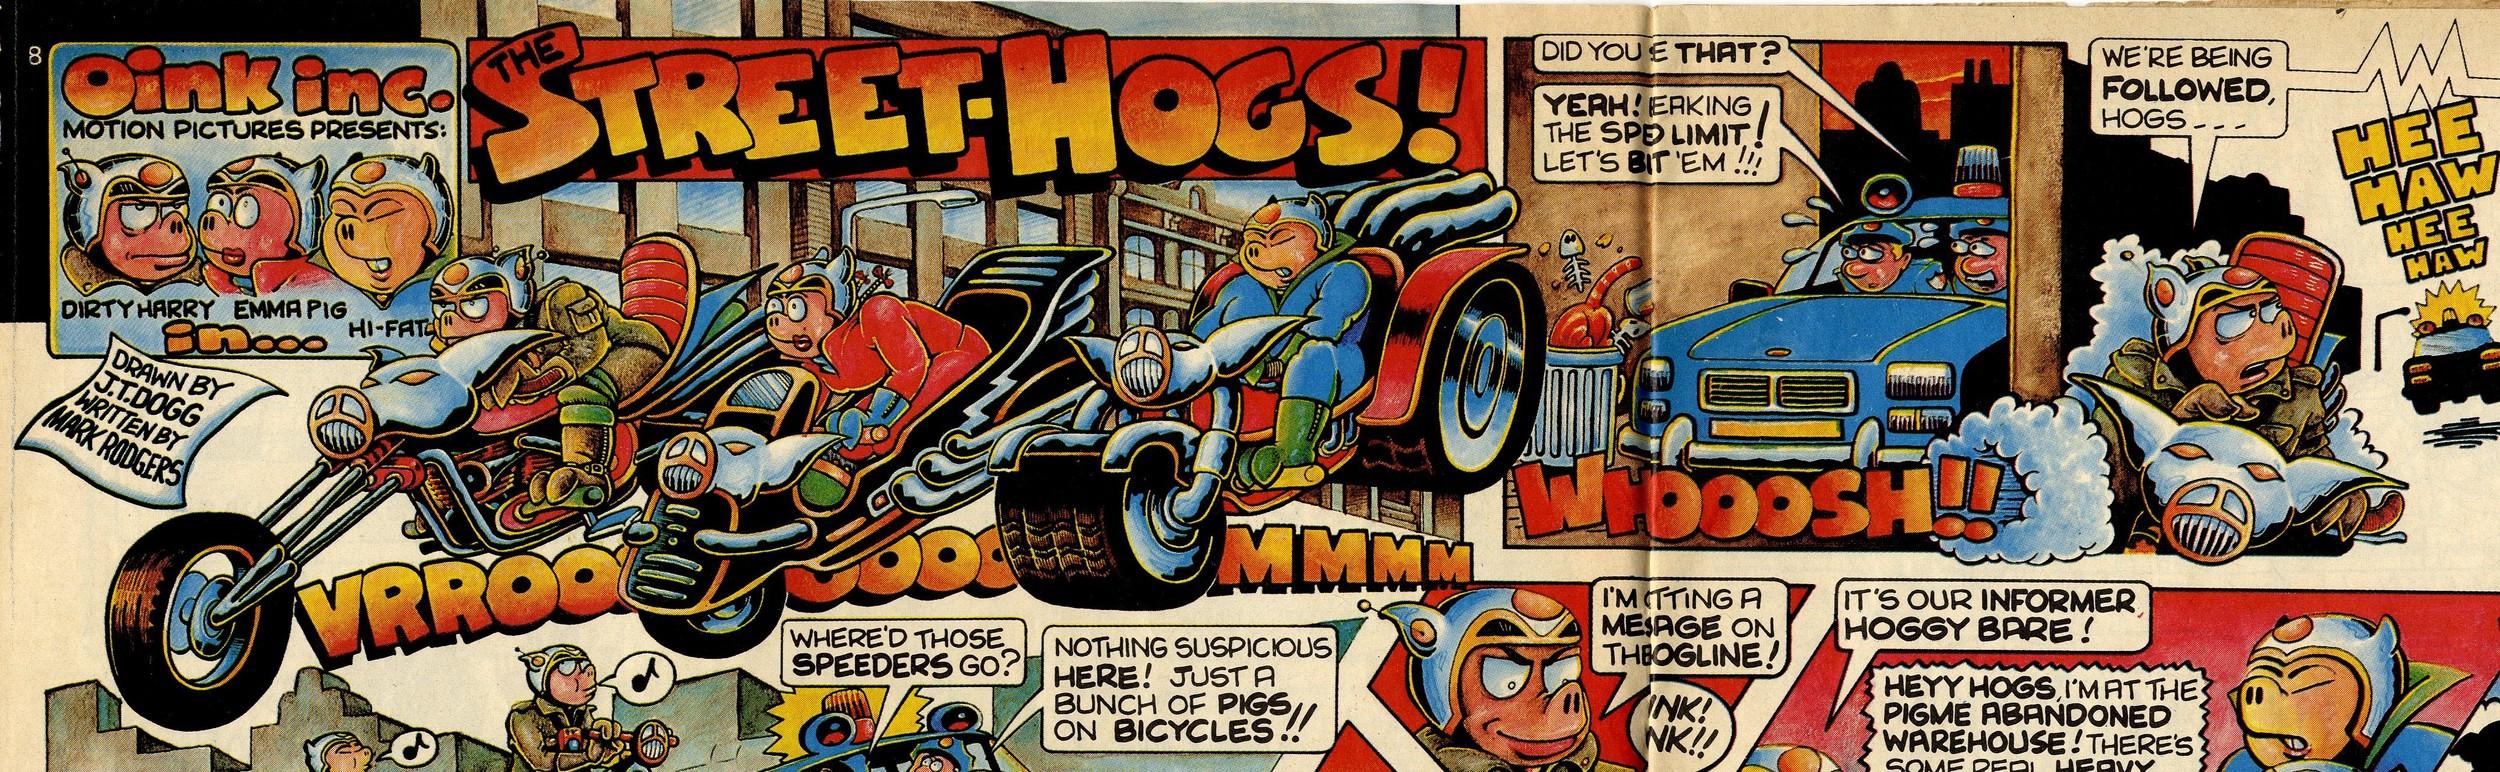 The Street-hogs!: Mark Rodgers (writer), Malcolm Douglas (artist)